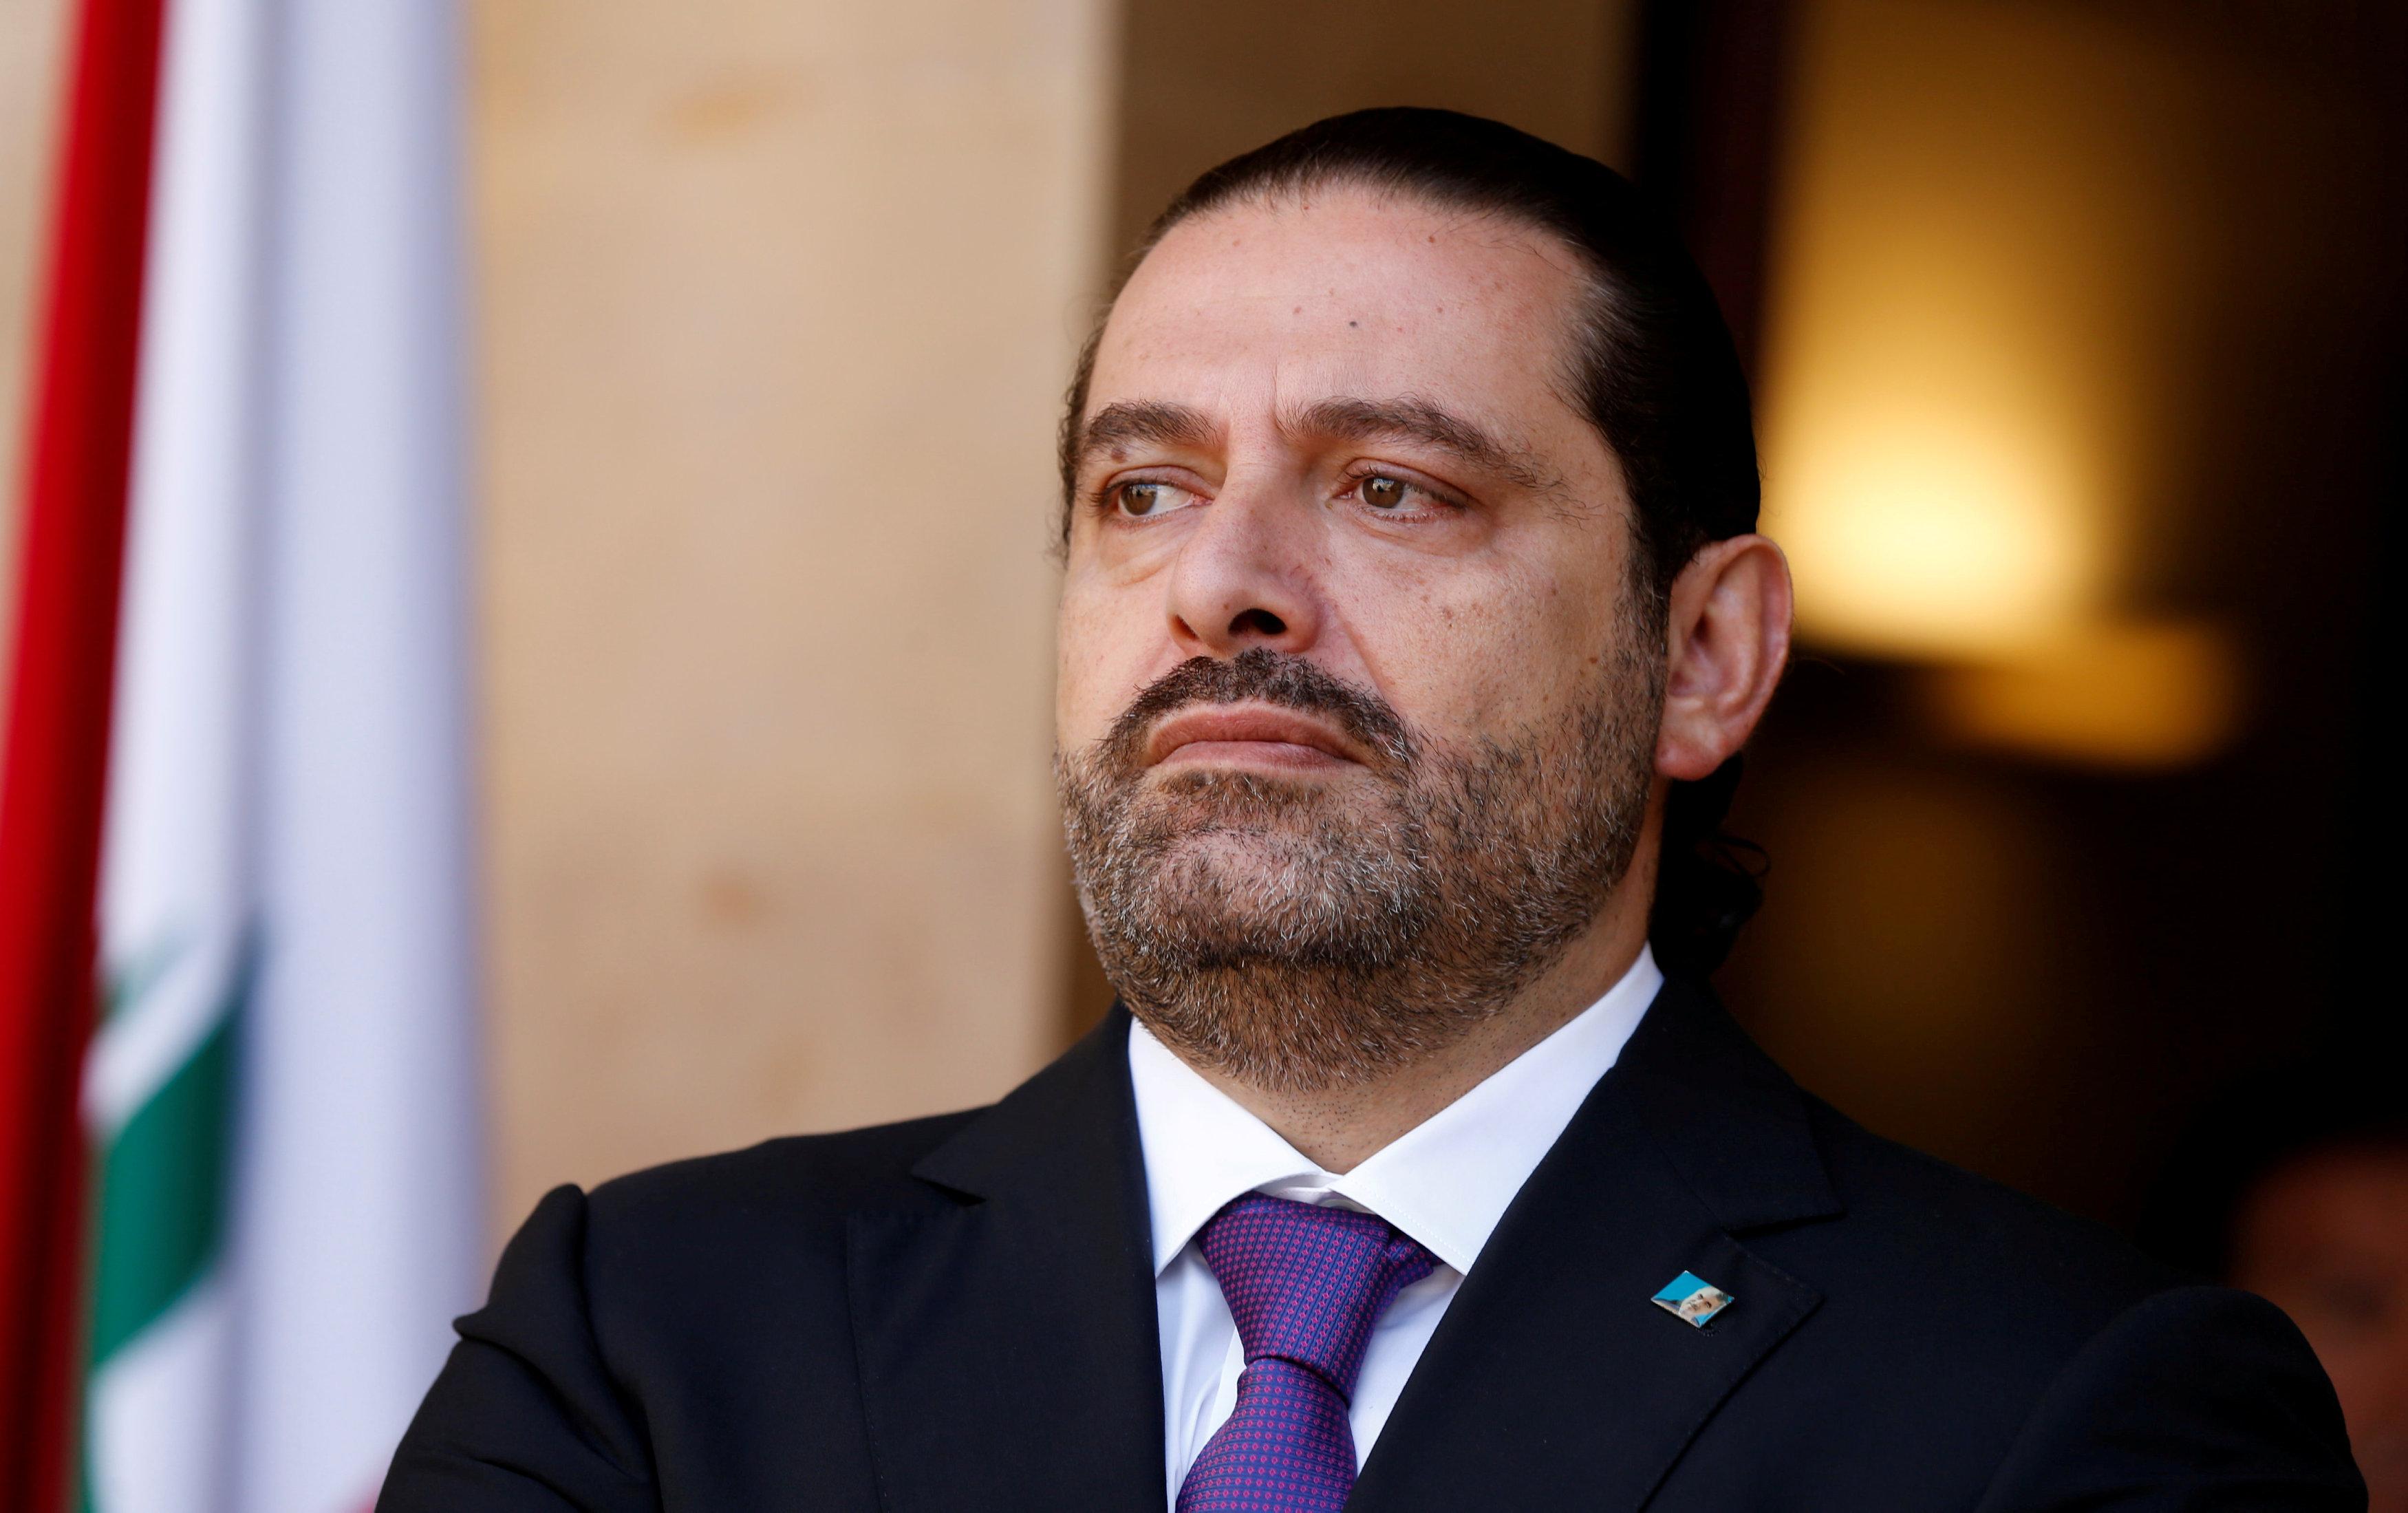 Western intelligence warned Hariri of death plot